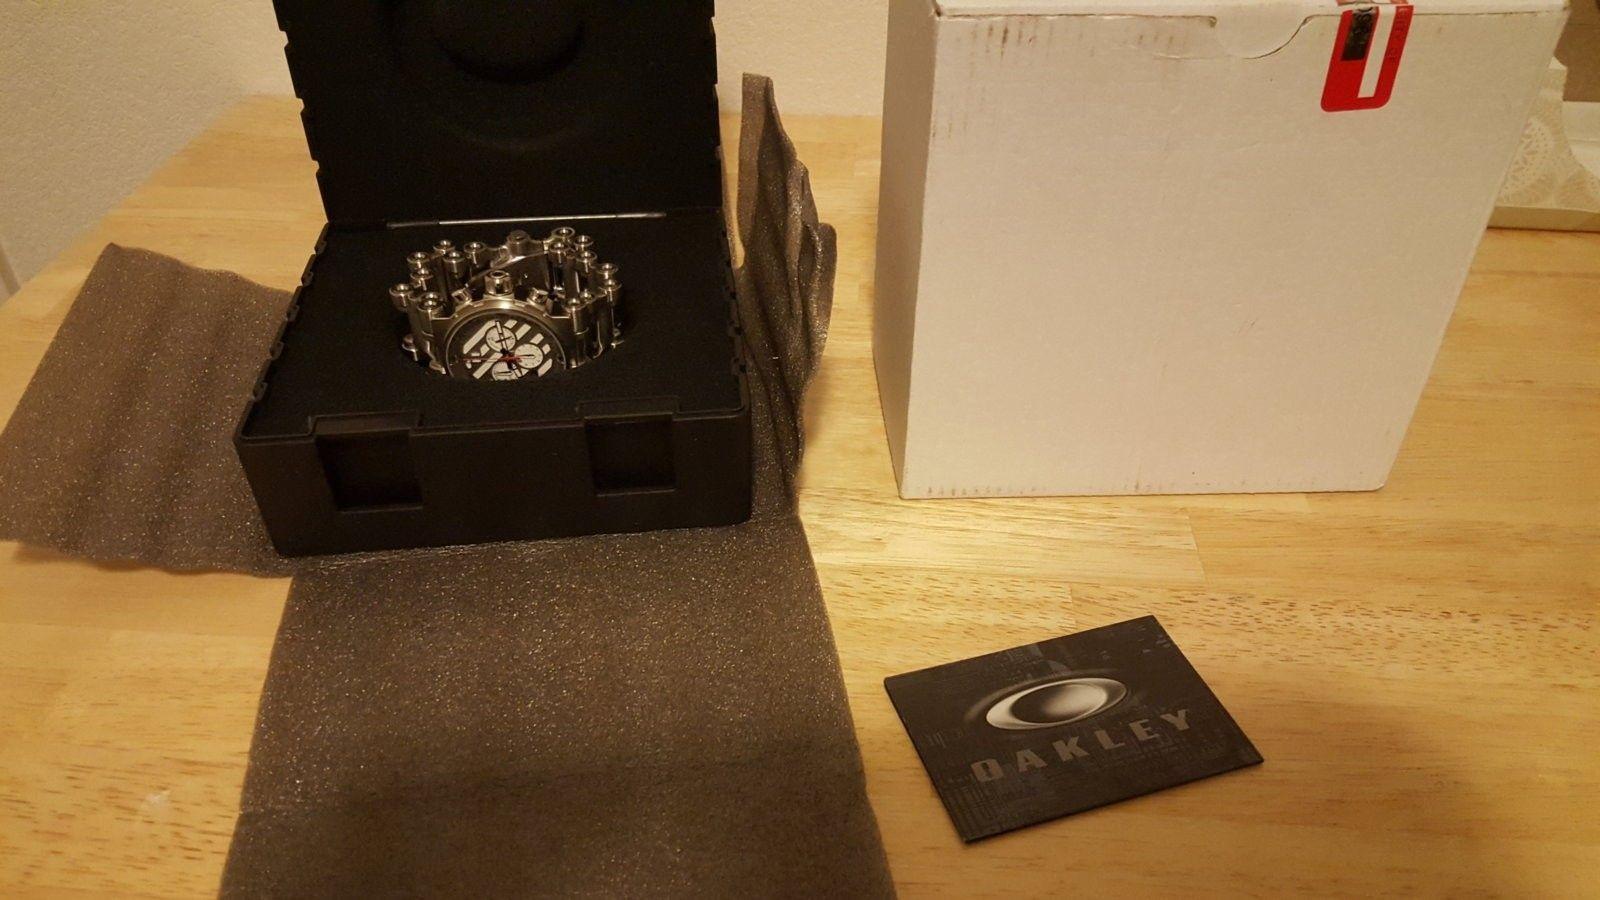 BNIB White Dial Hollow Point Watch $980 Shipped - 20160326_191631.jpg